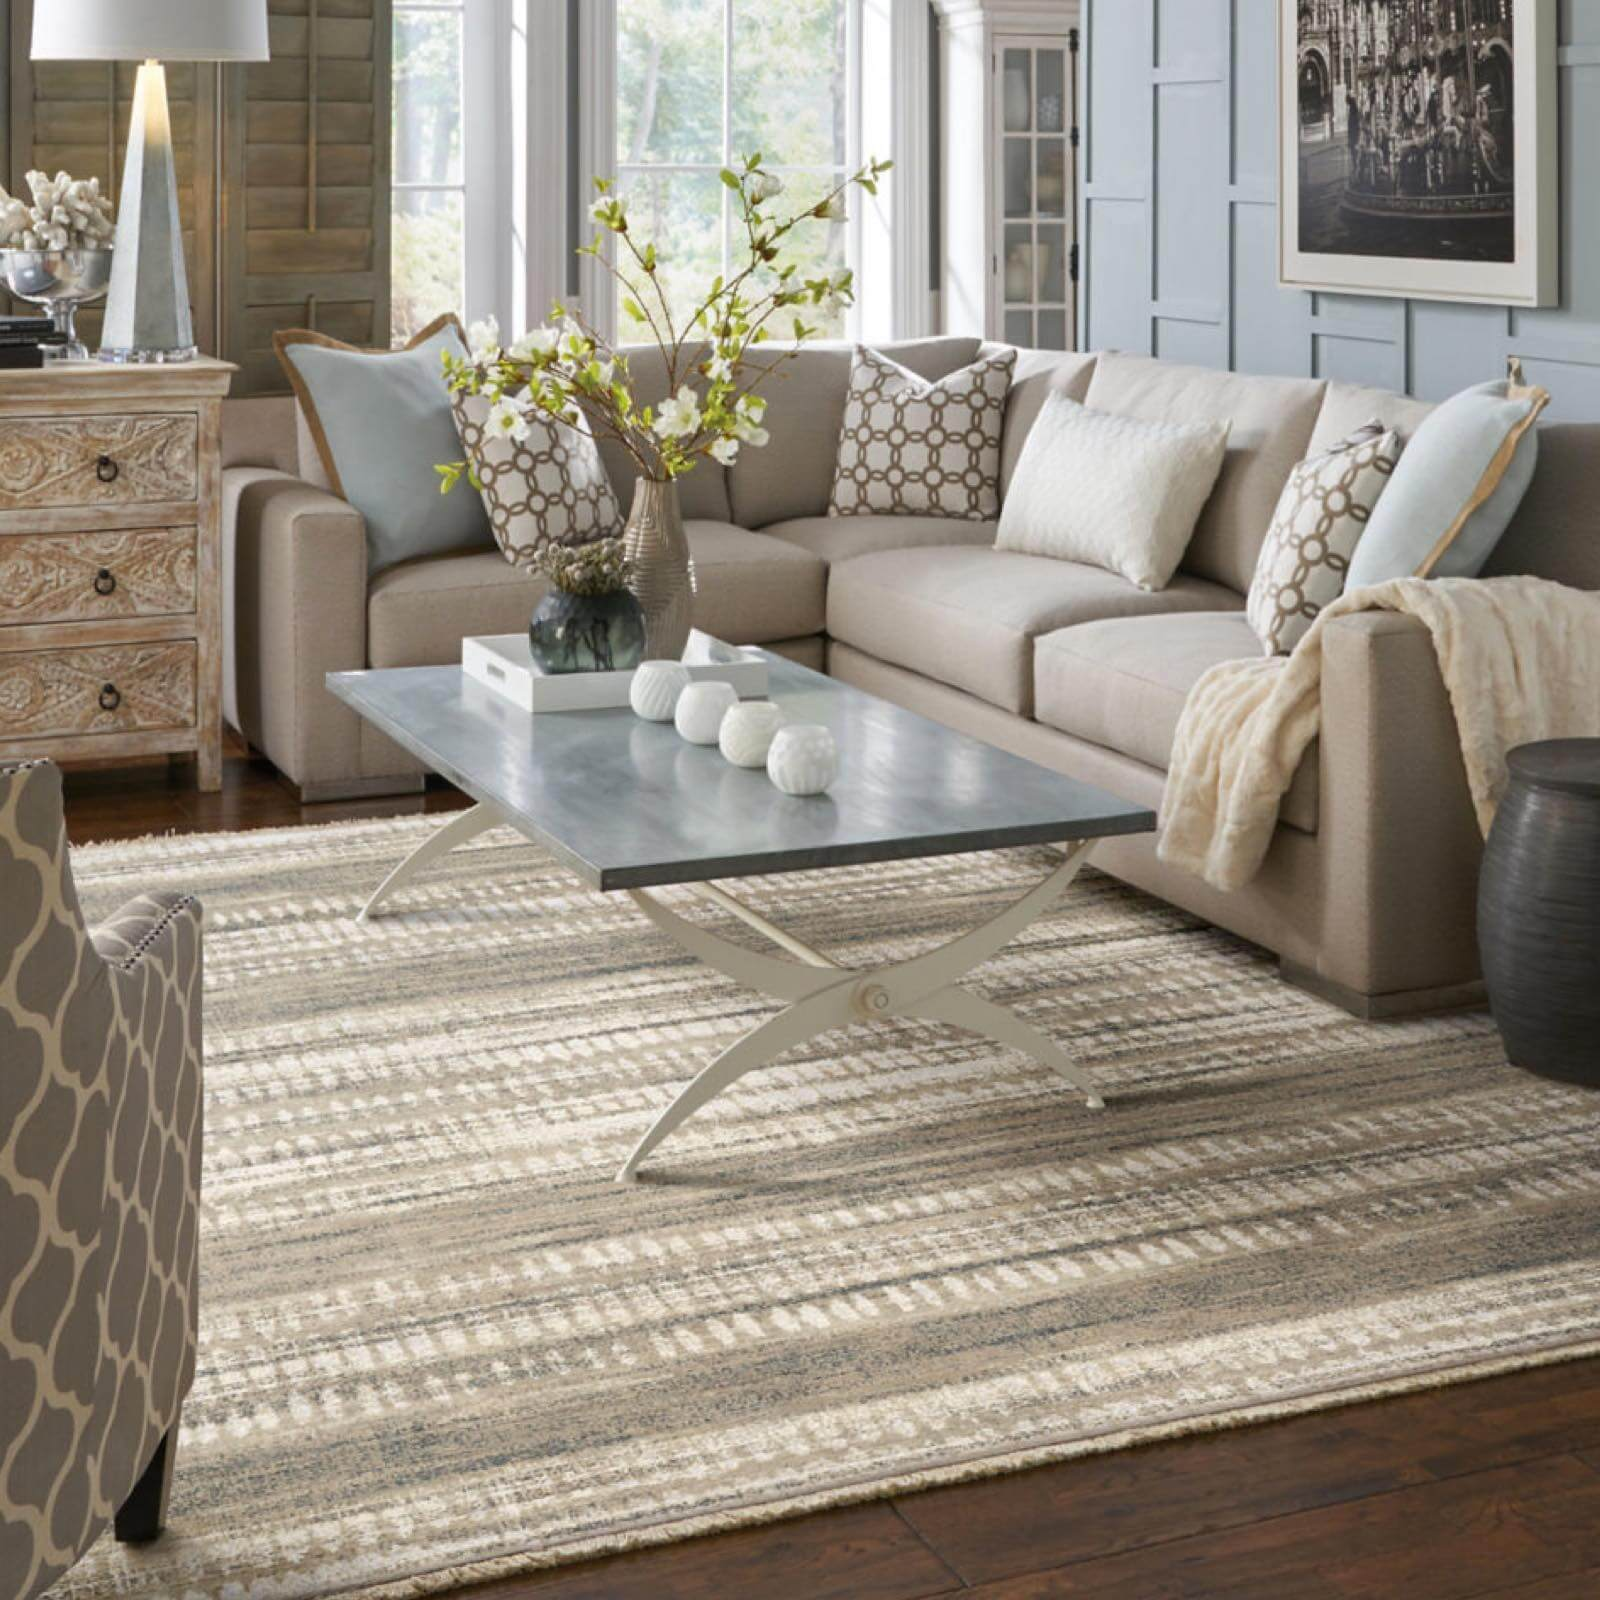 Karastan faded devine room | Great Floors